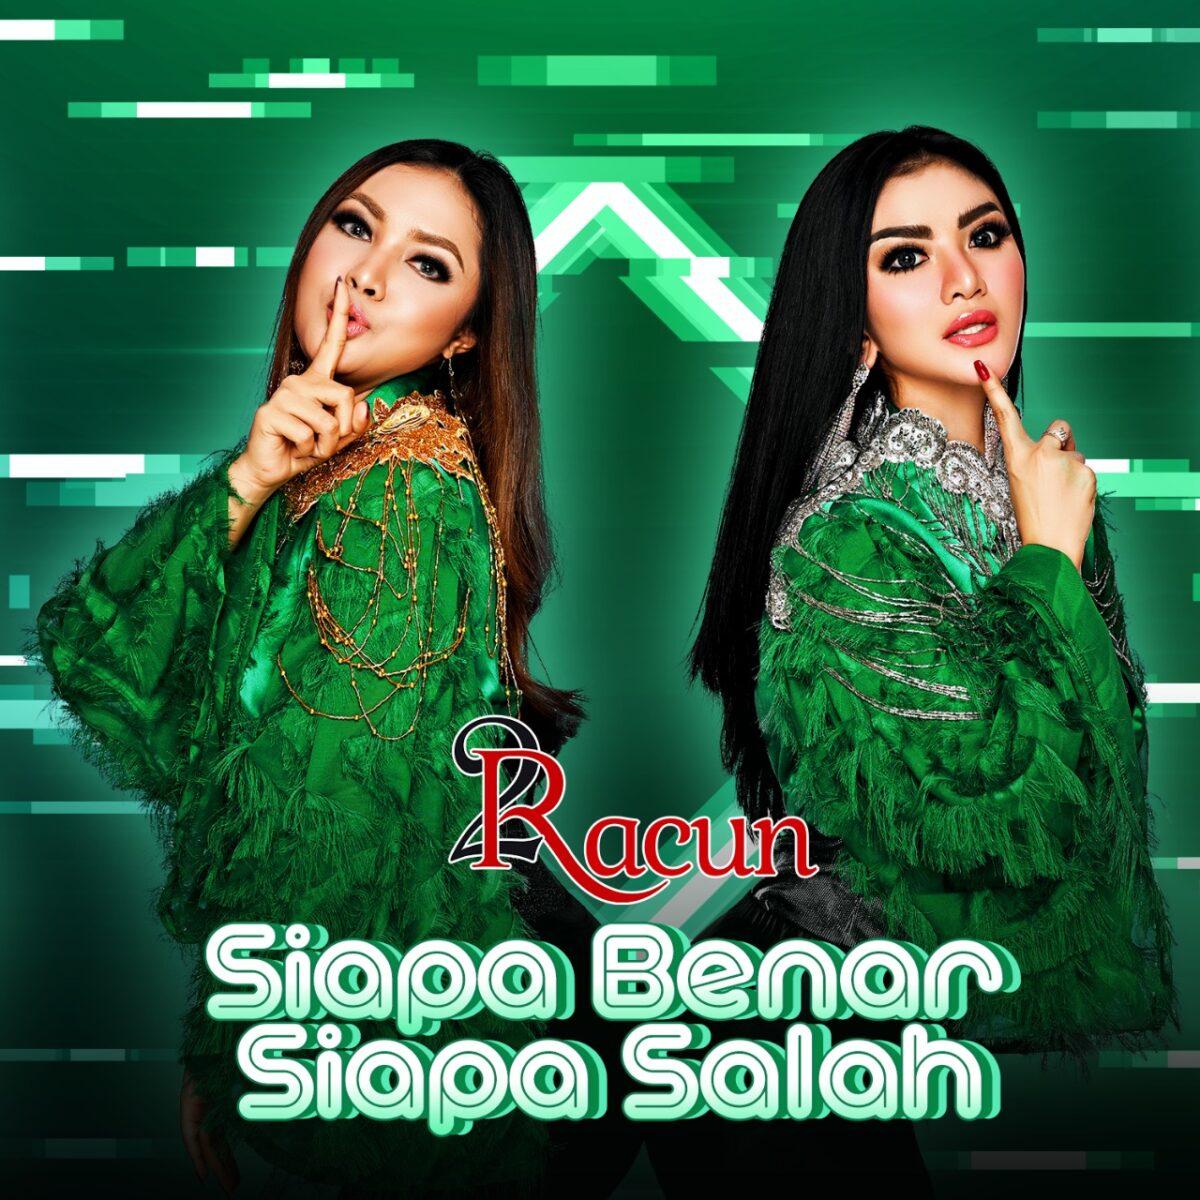 Rilis Single Lagu TikTok, 2Racun Berikan Warna Berbeda !